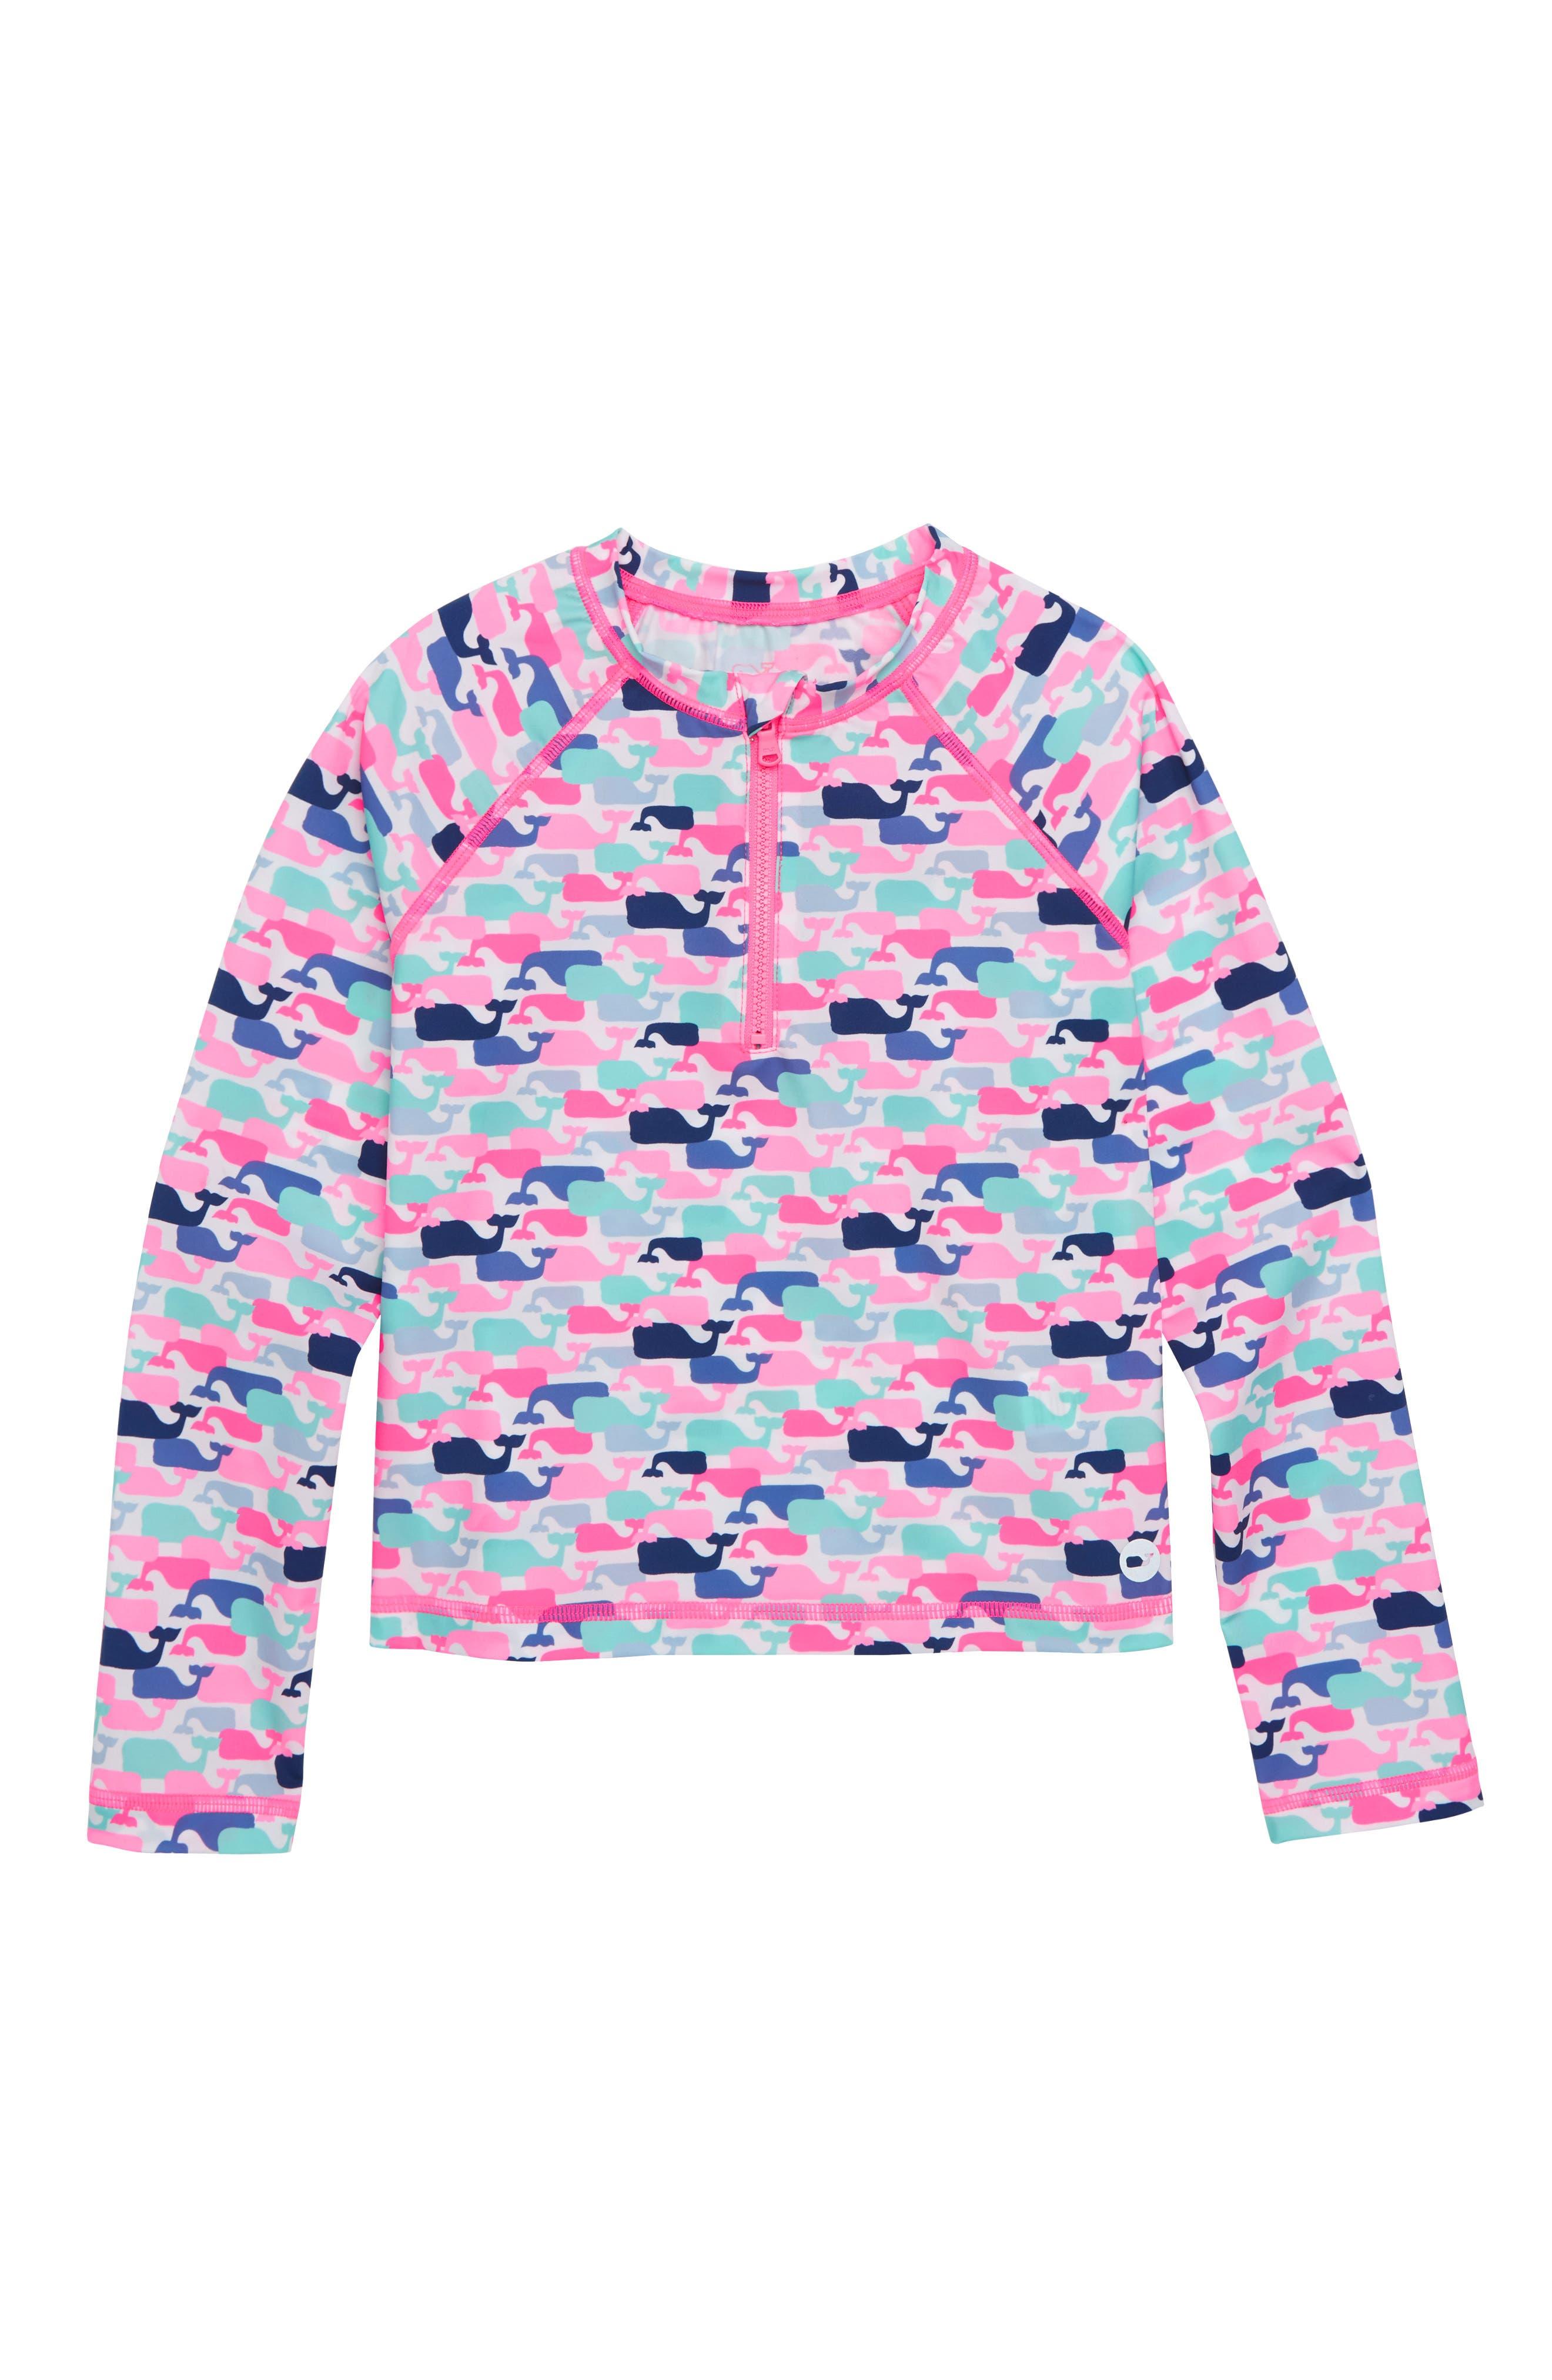 Whale Pattern Long Sleeve Rashguard,                         Main,                         color, 100